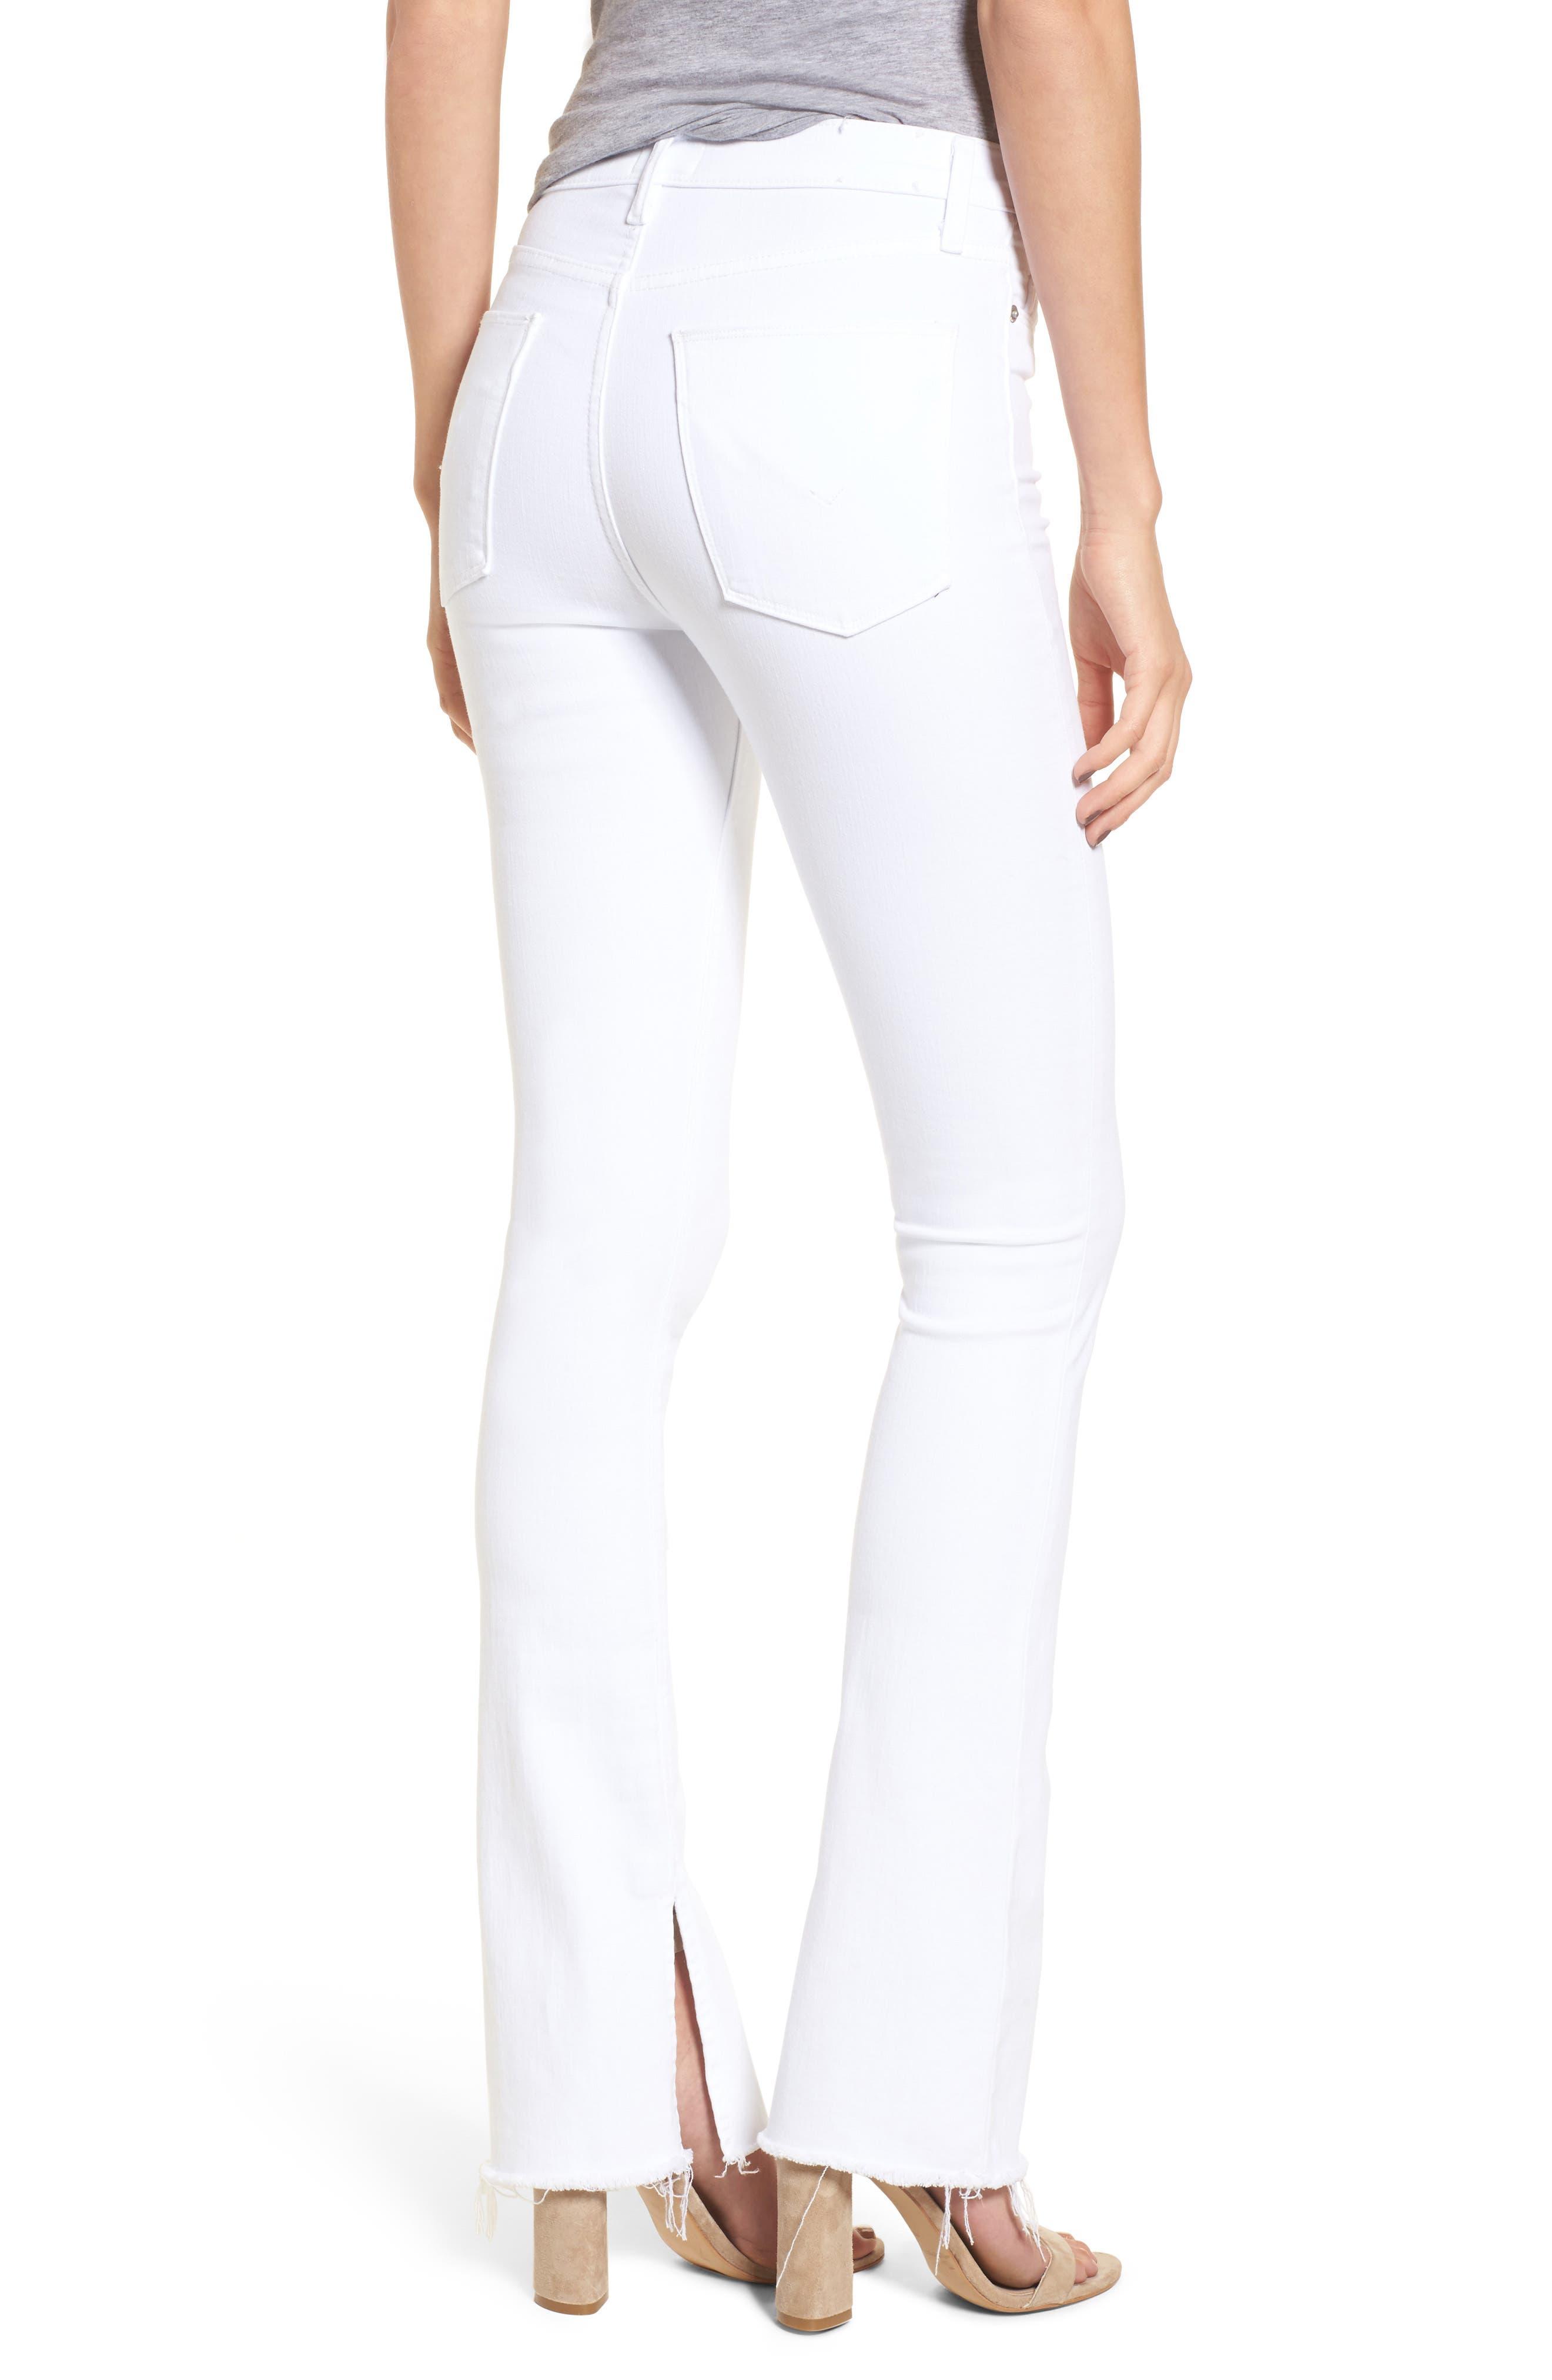 Alternate Image 2  - Hudson Jeans Heartbreaker High Waist Bootcut Jeans (Optical White)